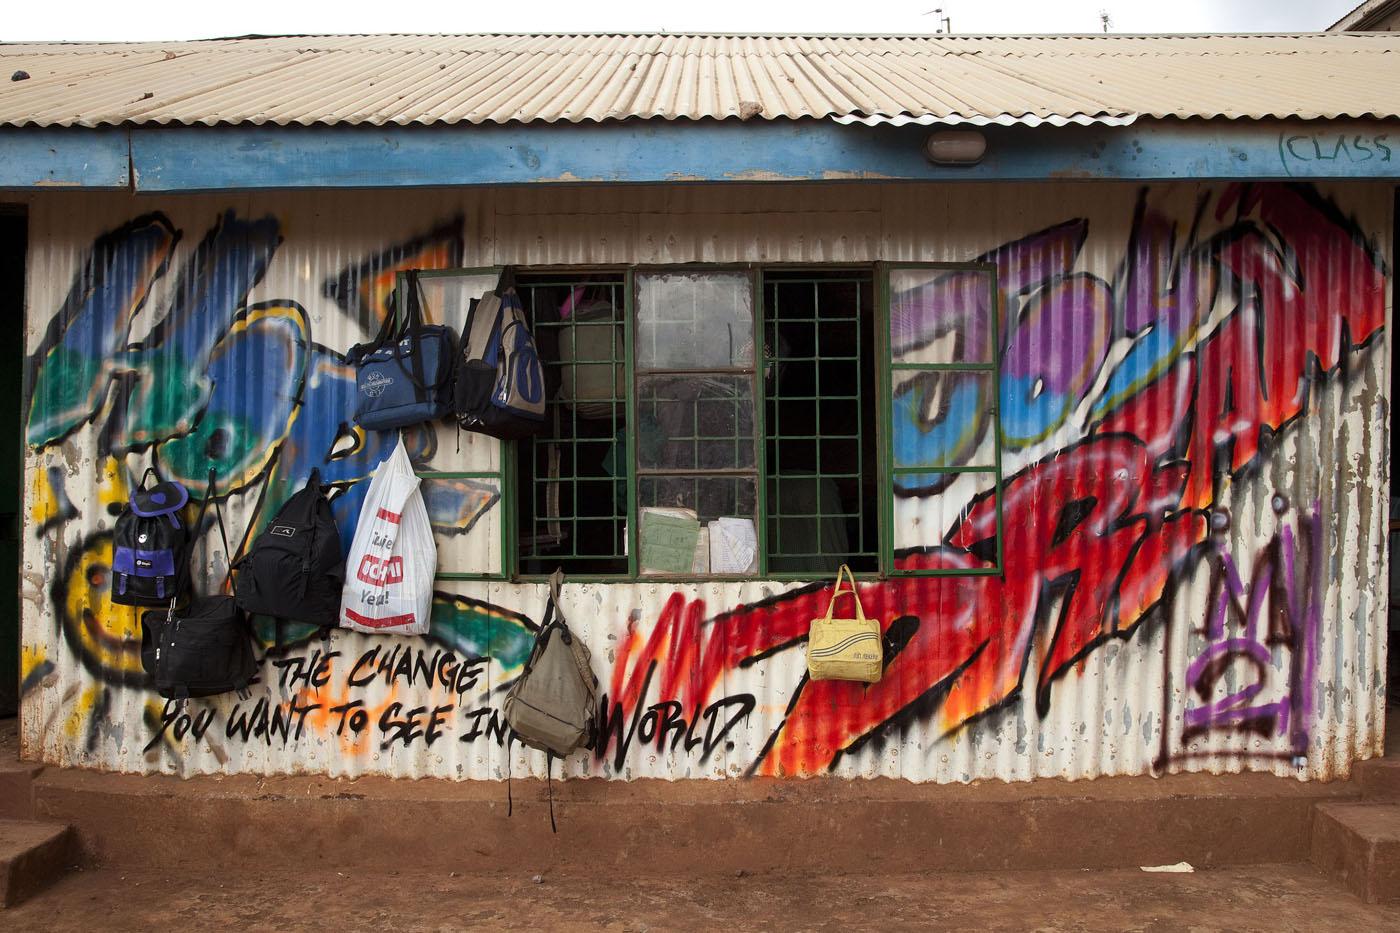 Streetart Workshop at a School